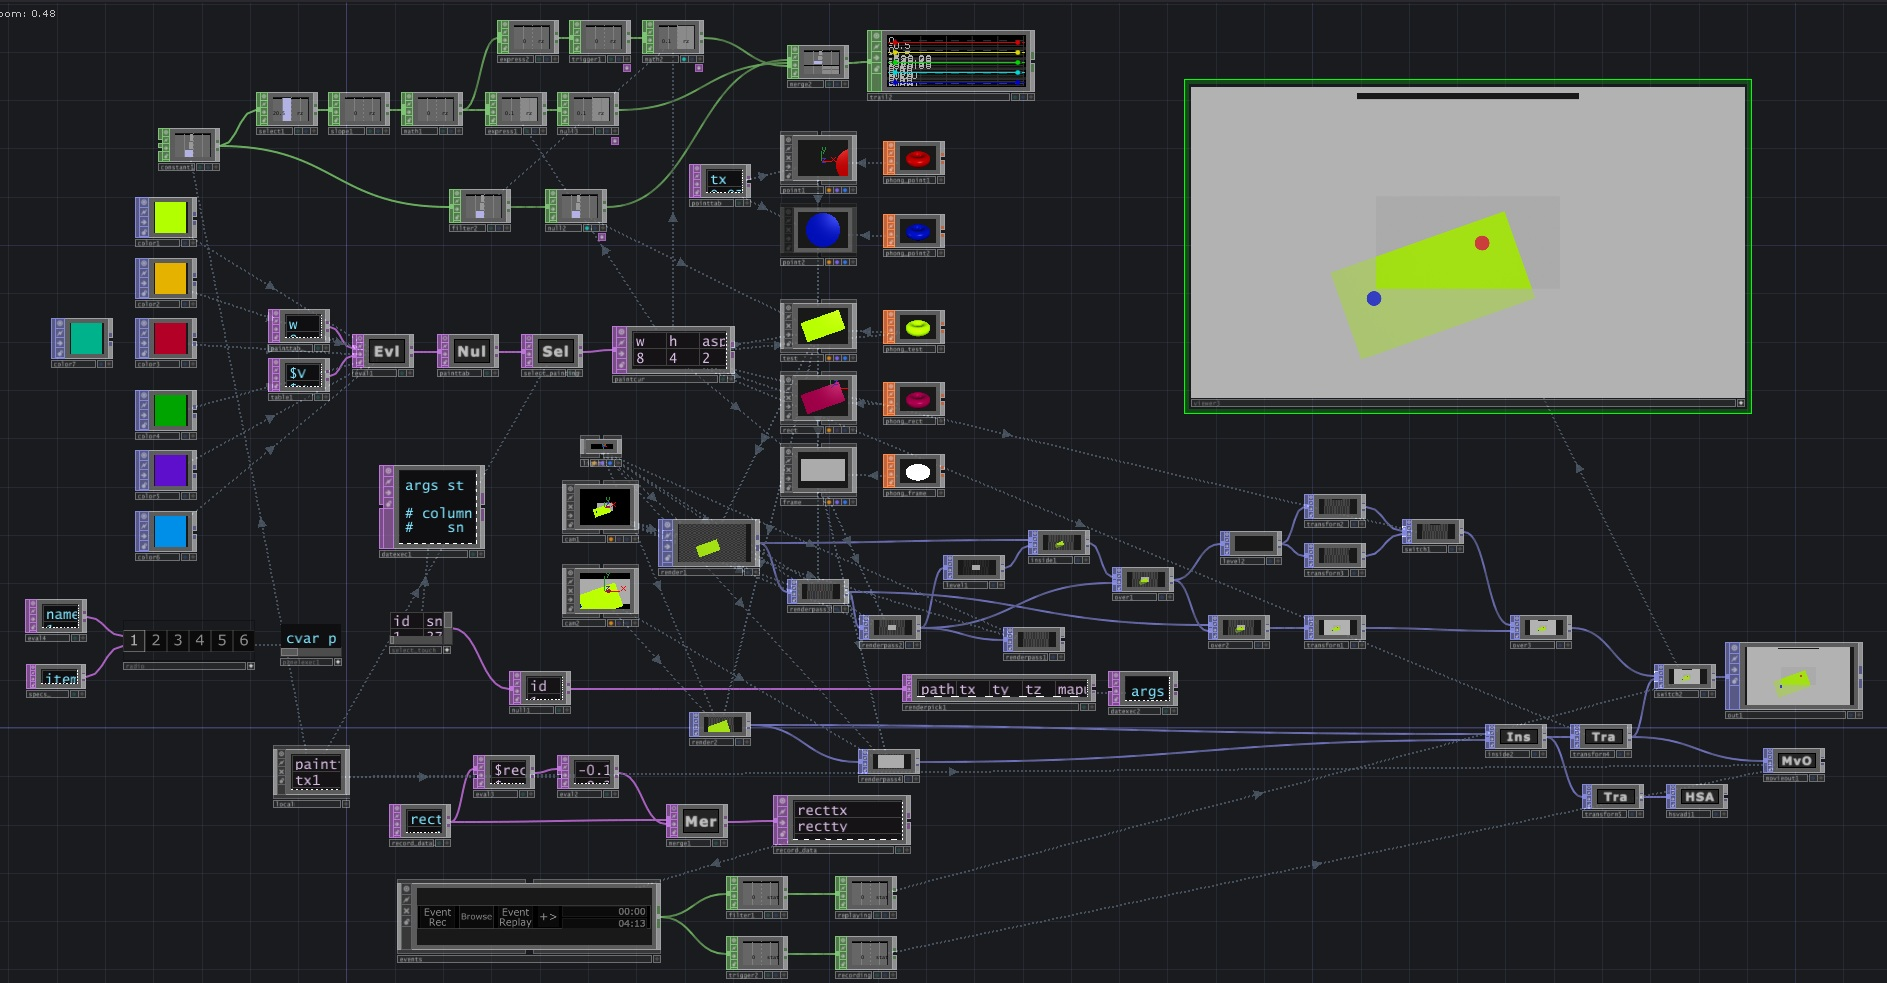 michaelsnowviewingsixscreenshot.1.jpg